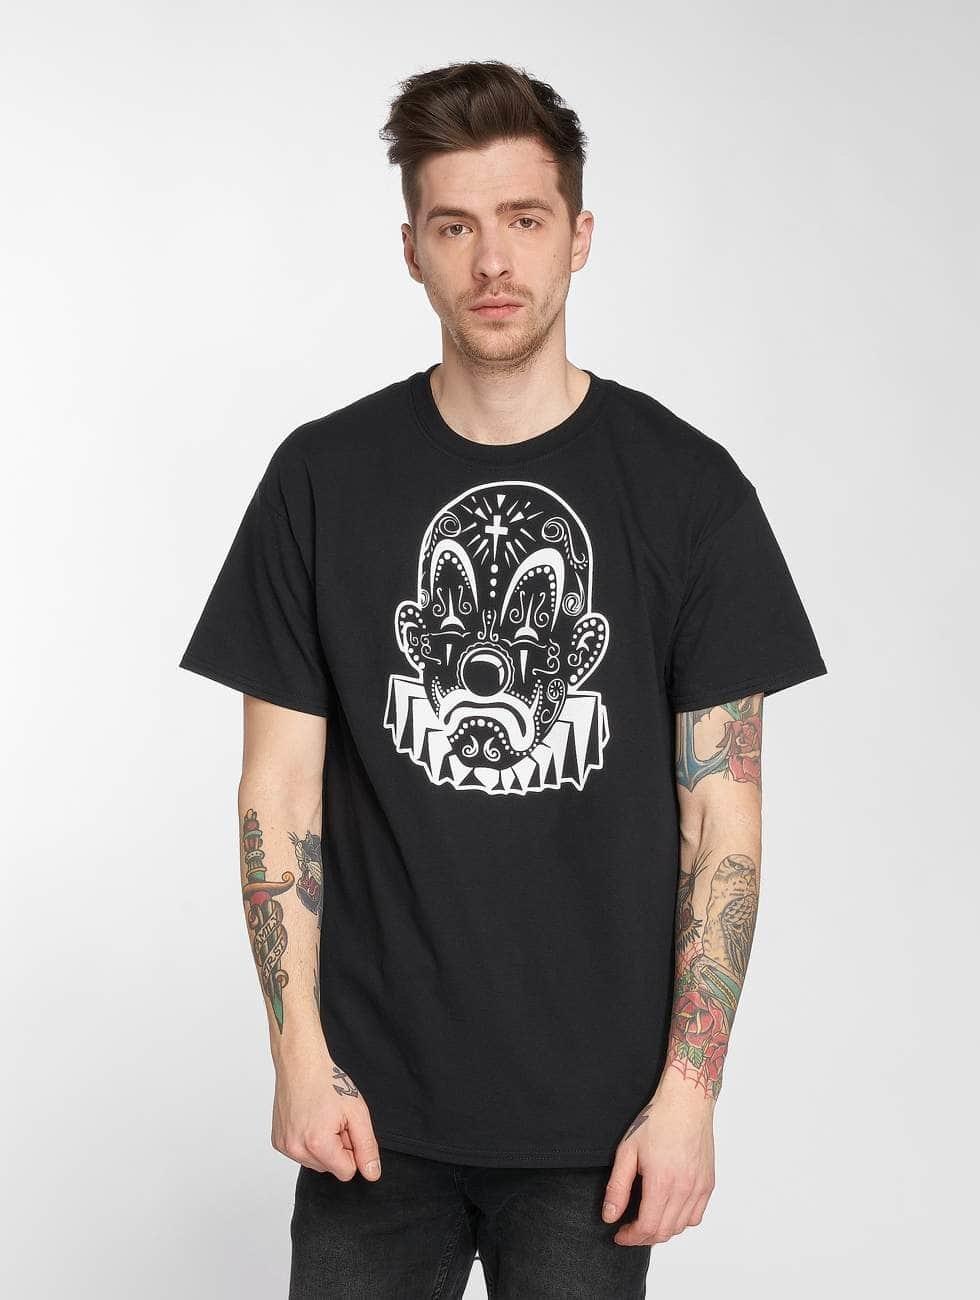 Joker T-shirts Mexico Clown sort